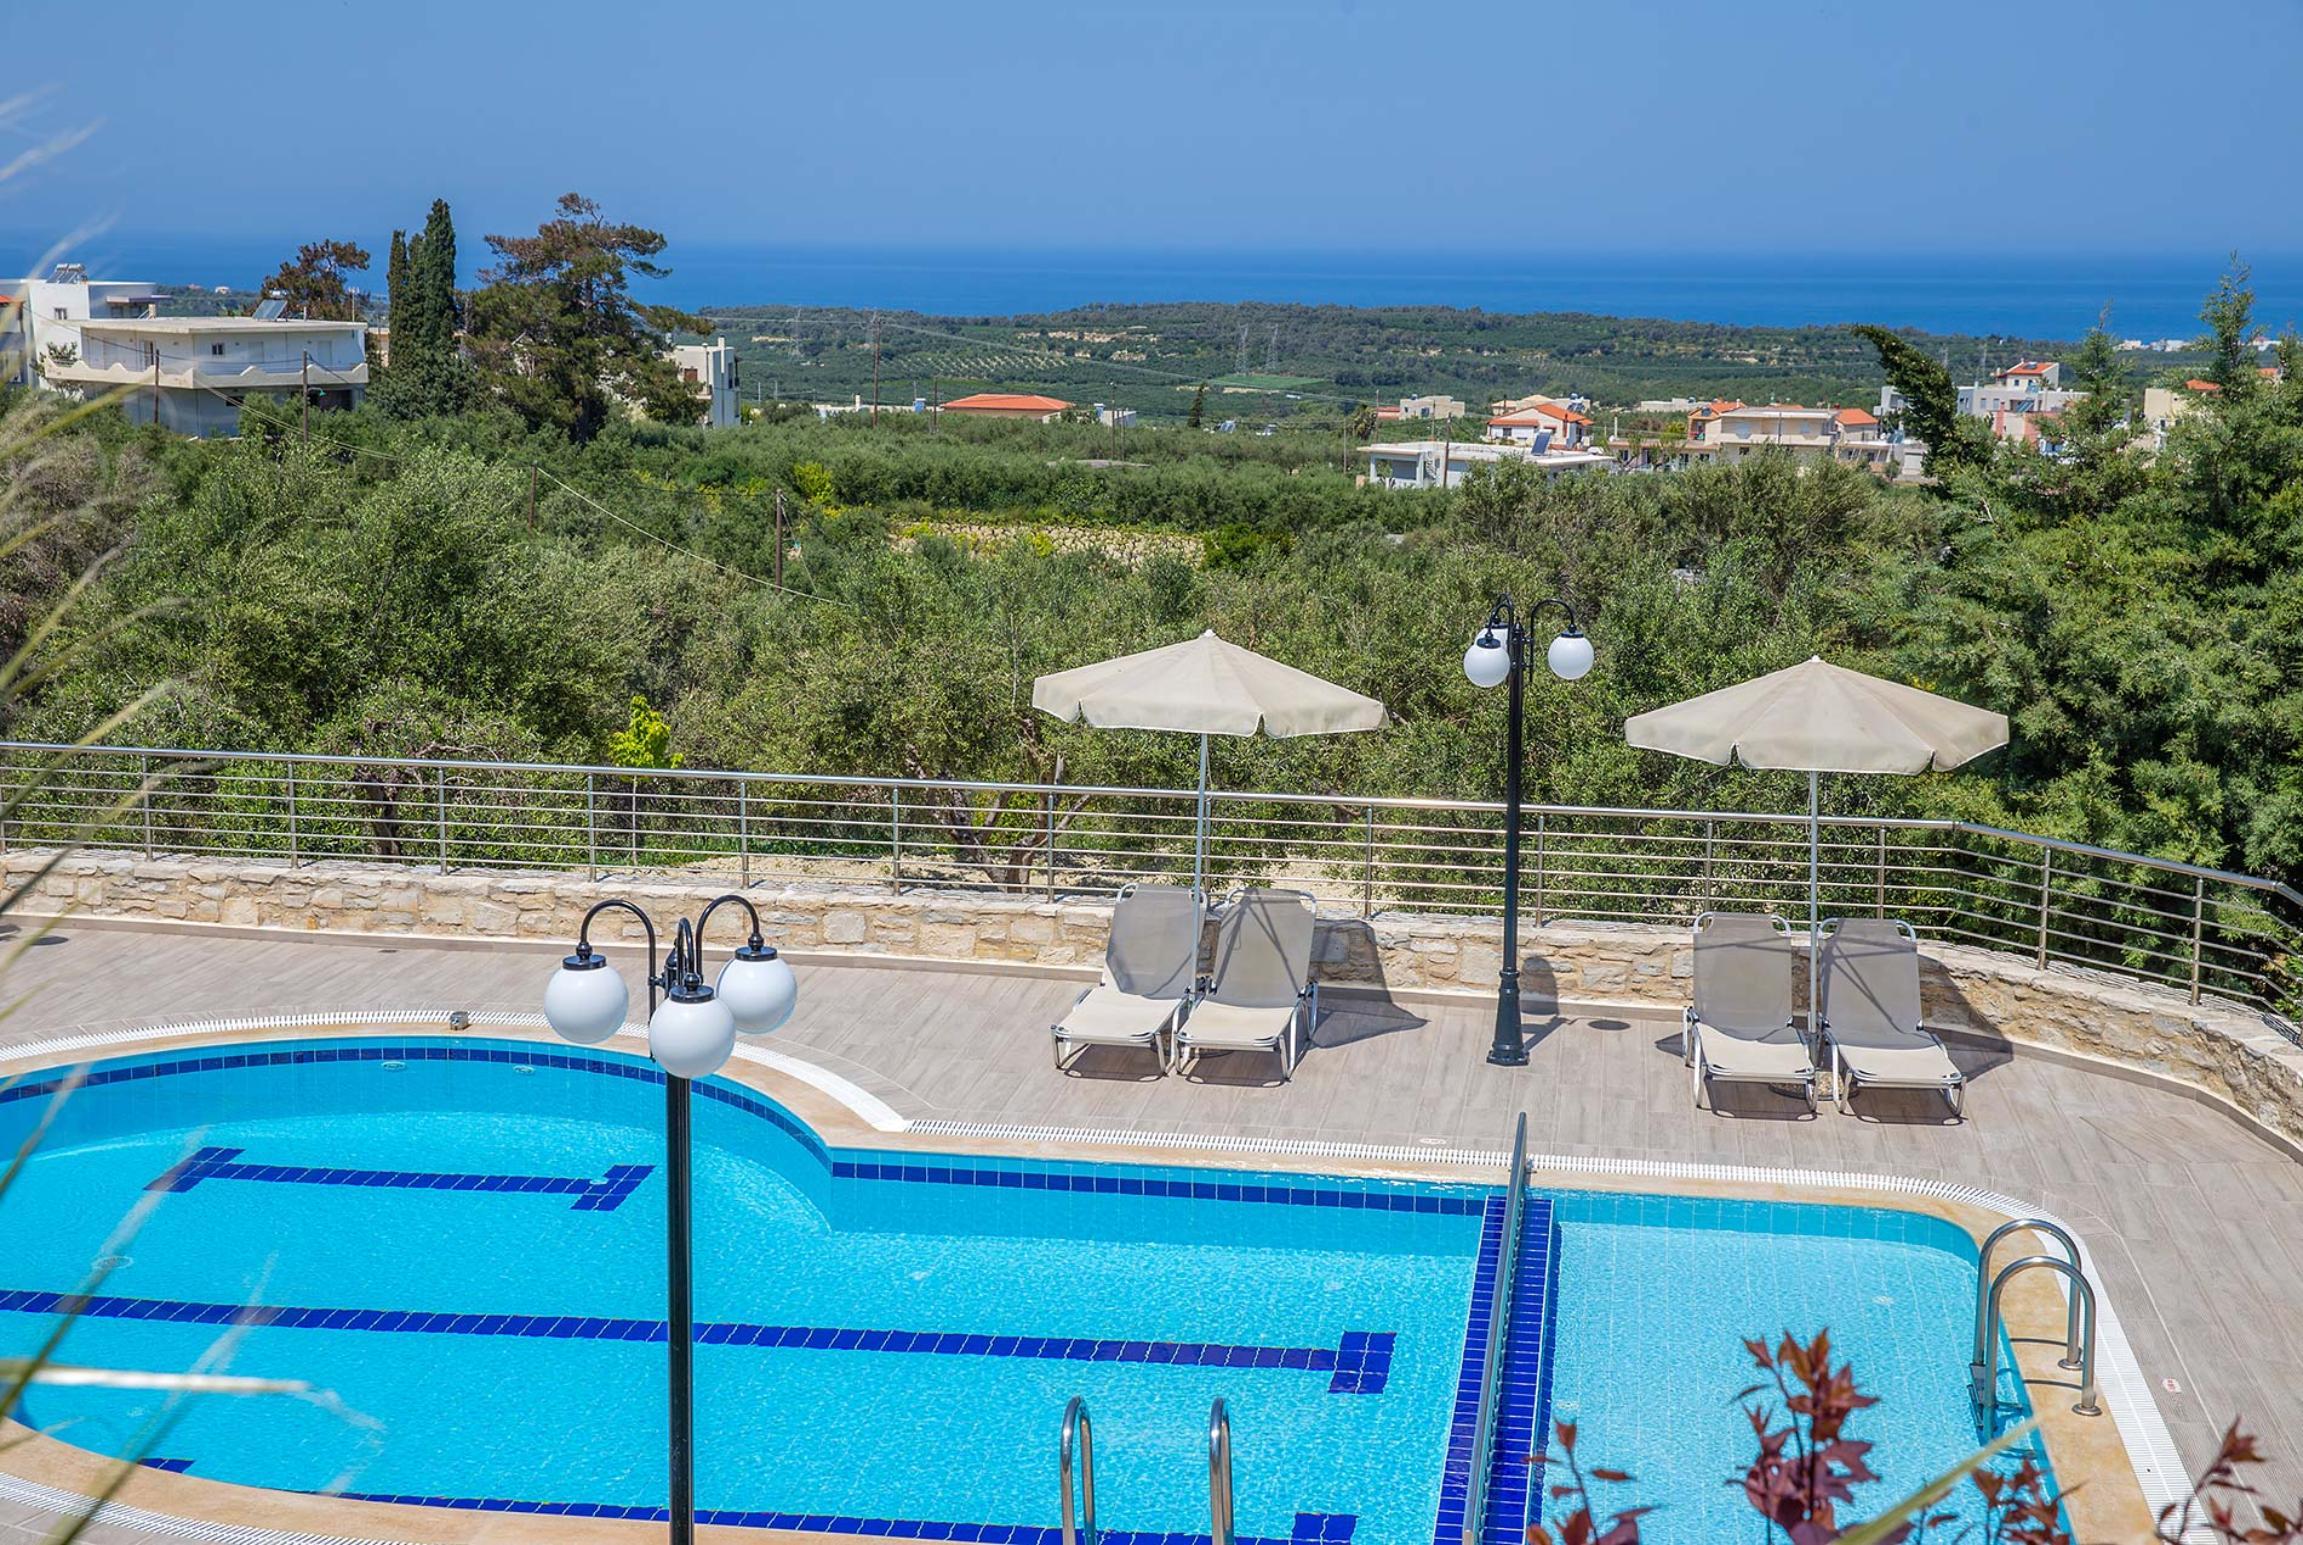 Ferienhaus Kyveli (2654321), Rethymno, Kreta Nordküste, Kreta, Griechenland, Bild 24